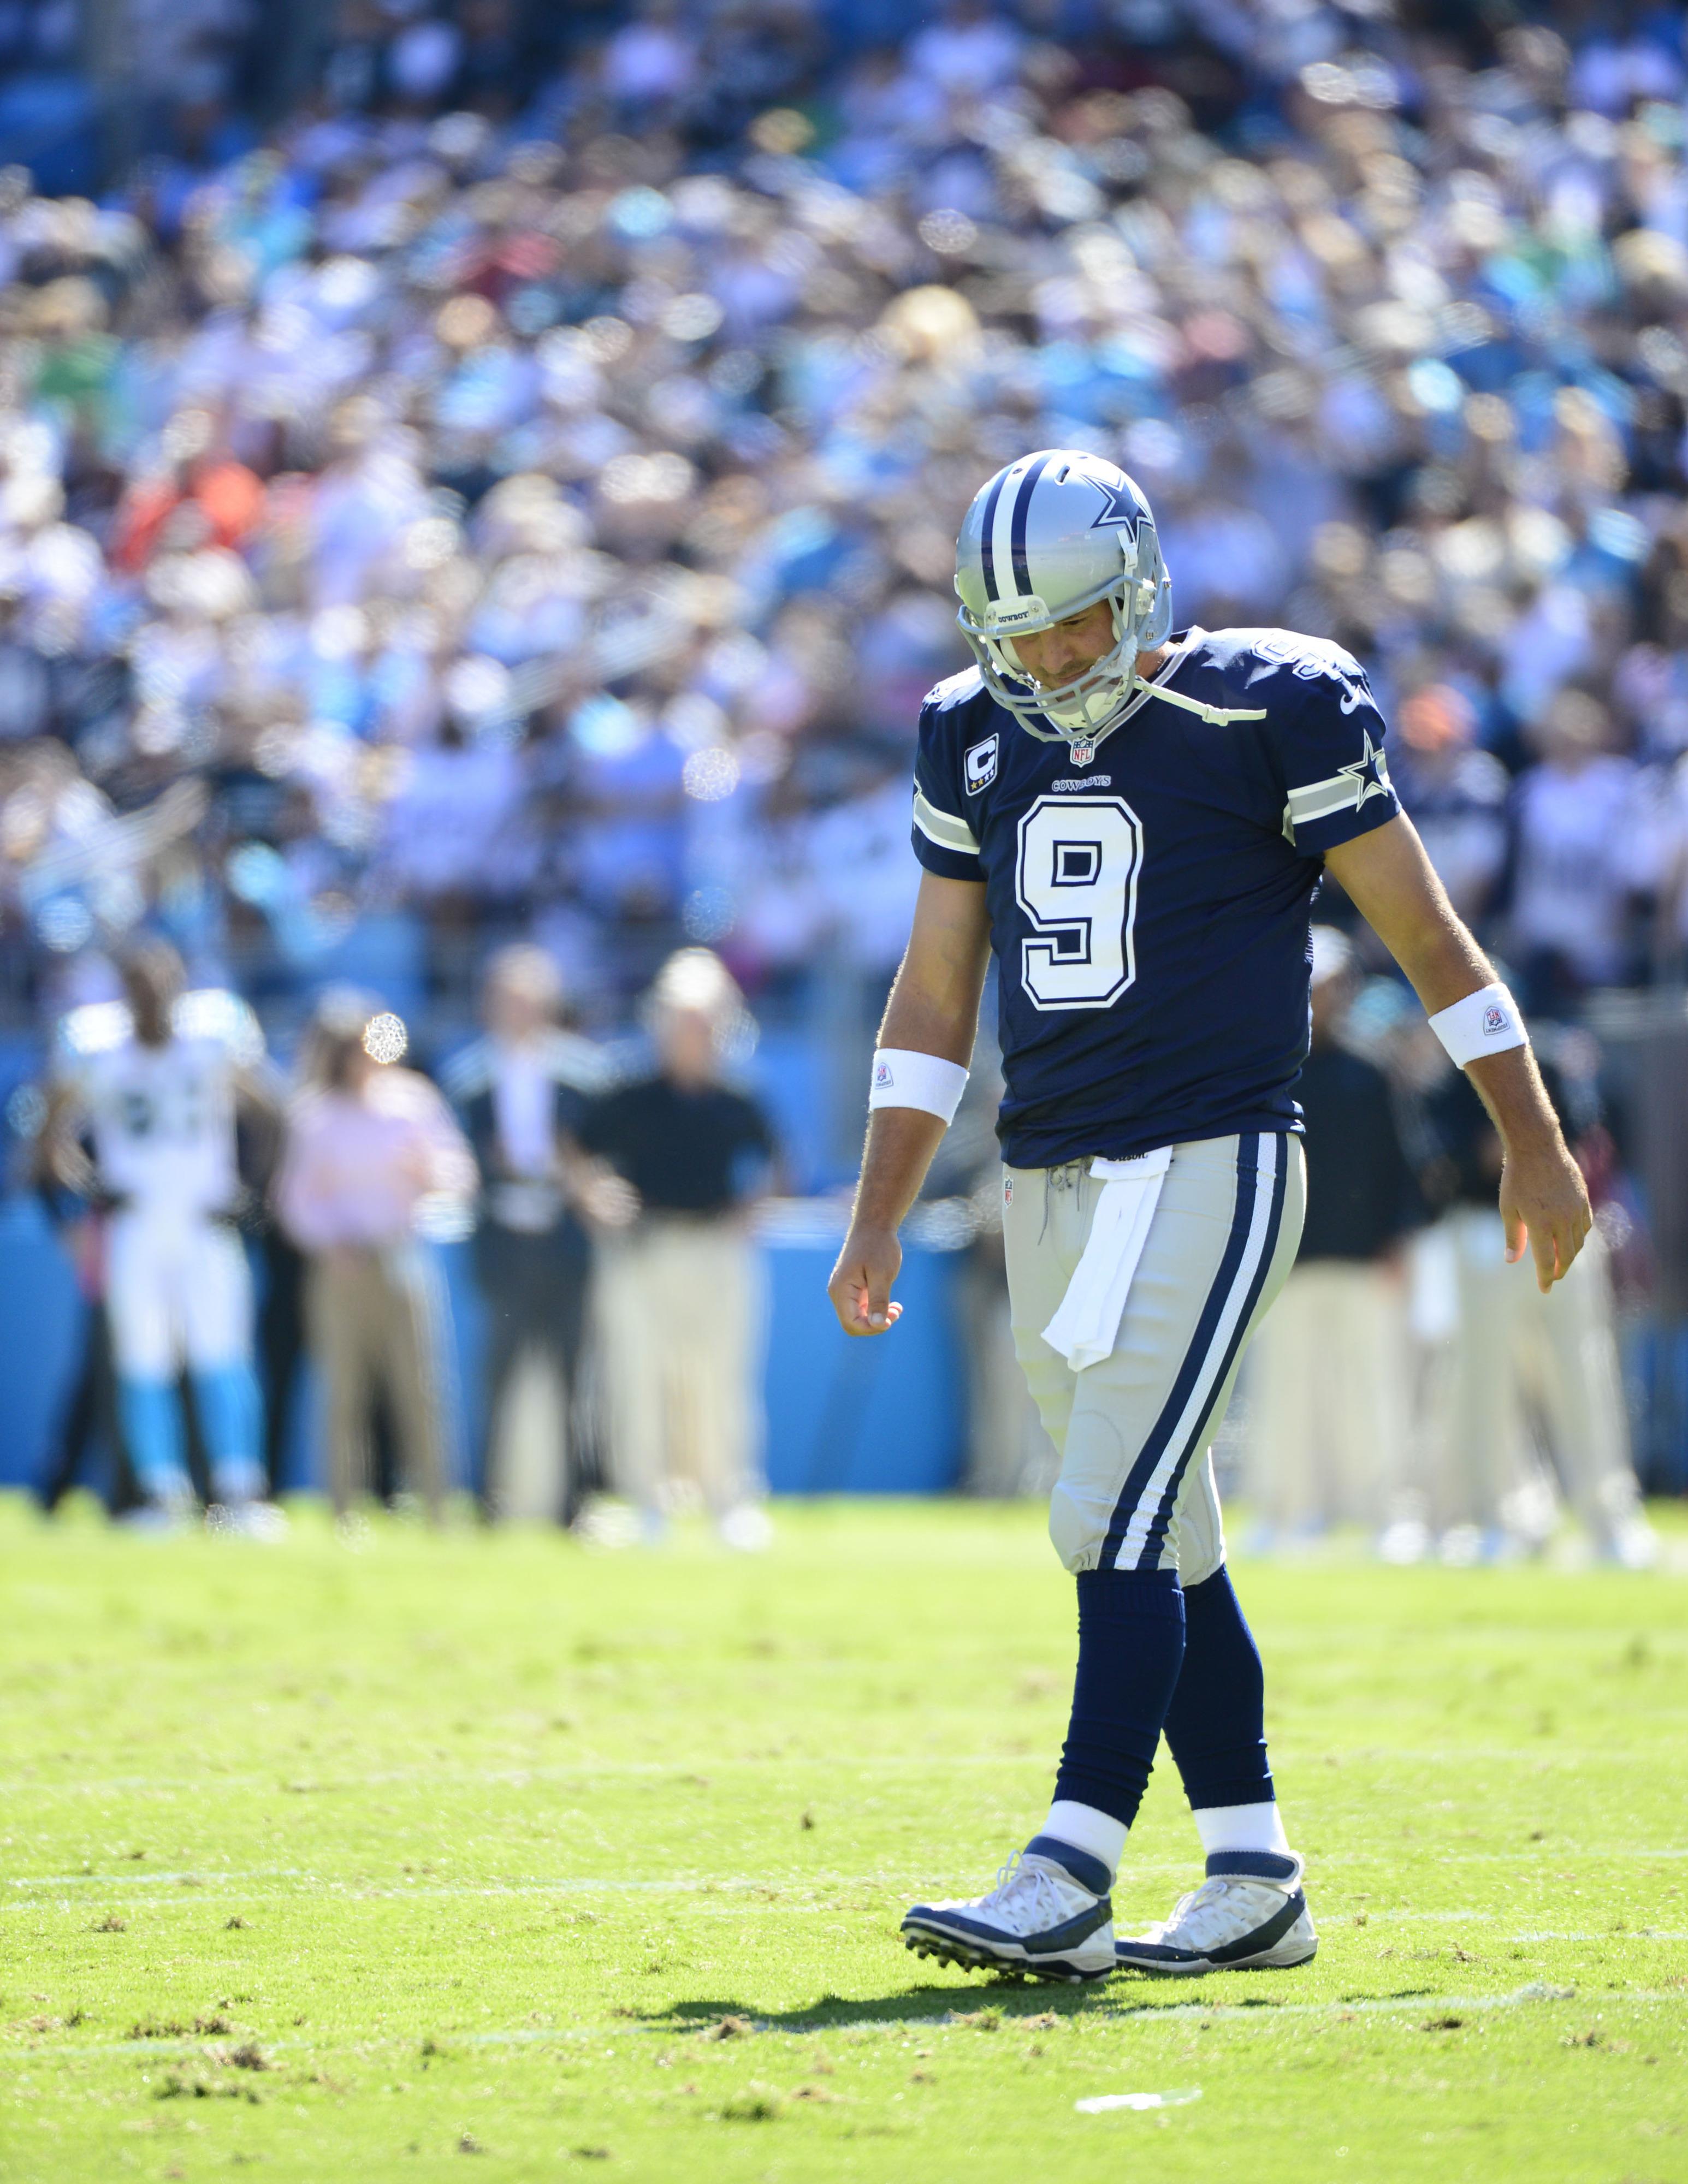 Tony Romo injury: Cowboys QB plans for pain-killer shot before Rams game